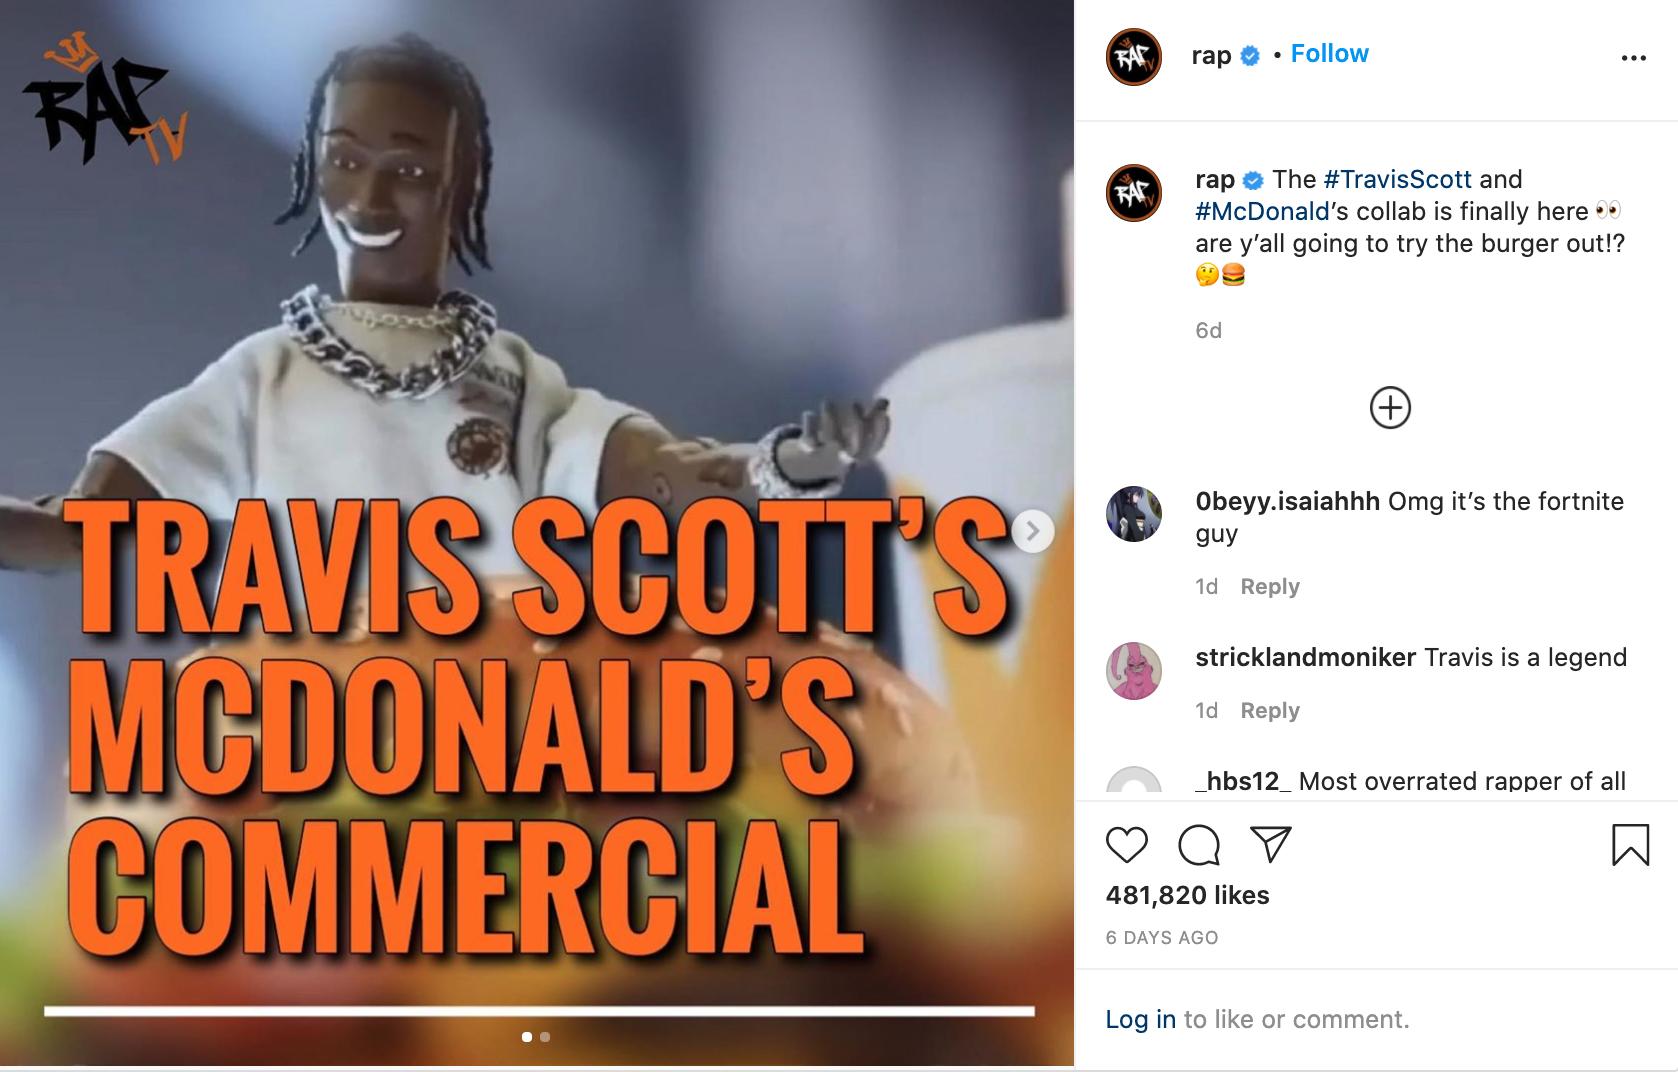 mcdonalds insta post